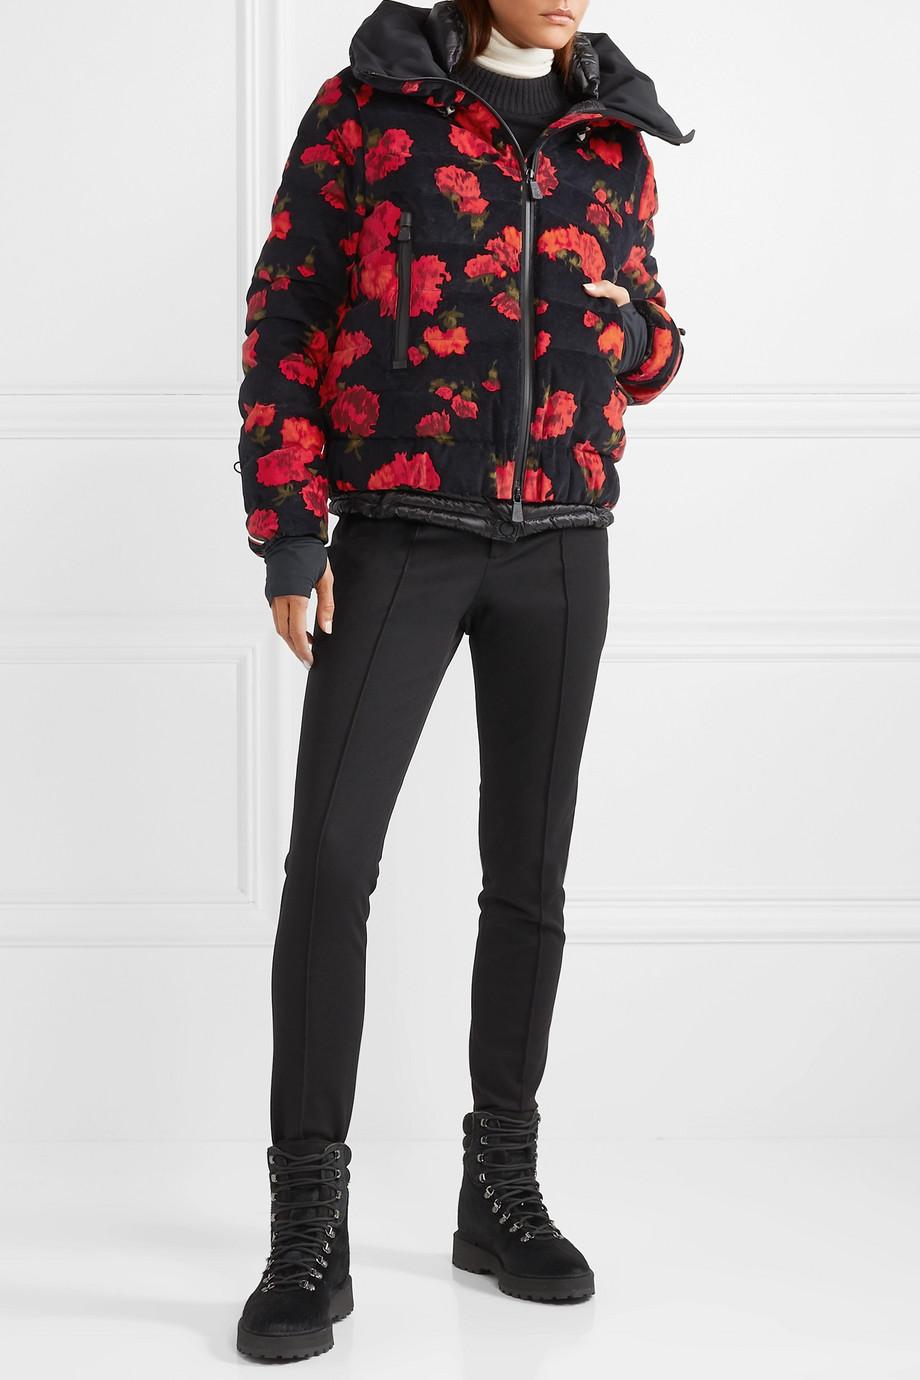 Moncler Genius + 3 Grenoble floral-print quilted cotton-blend down jacket